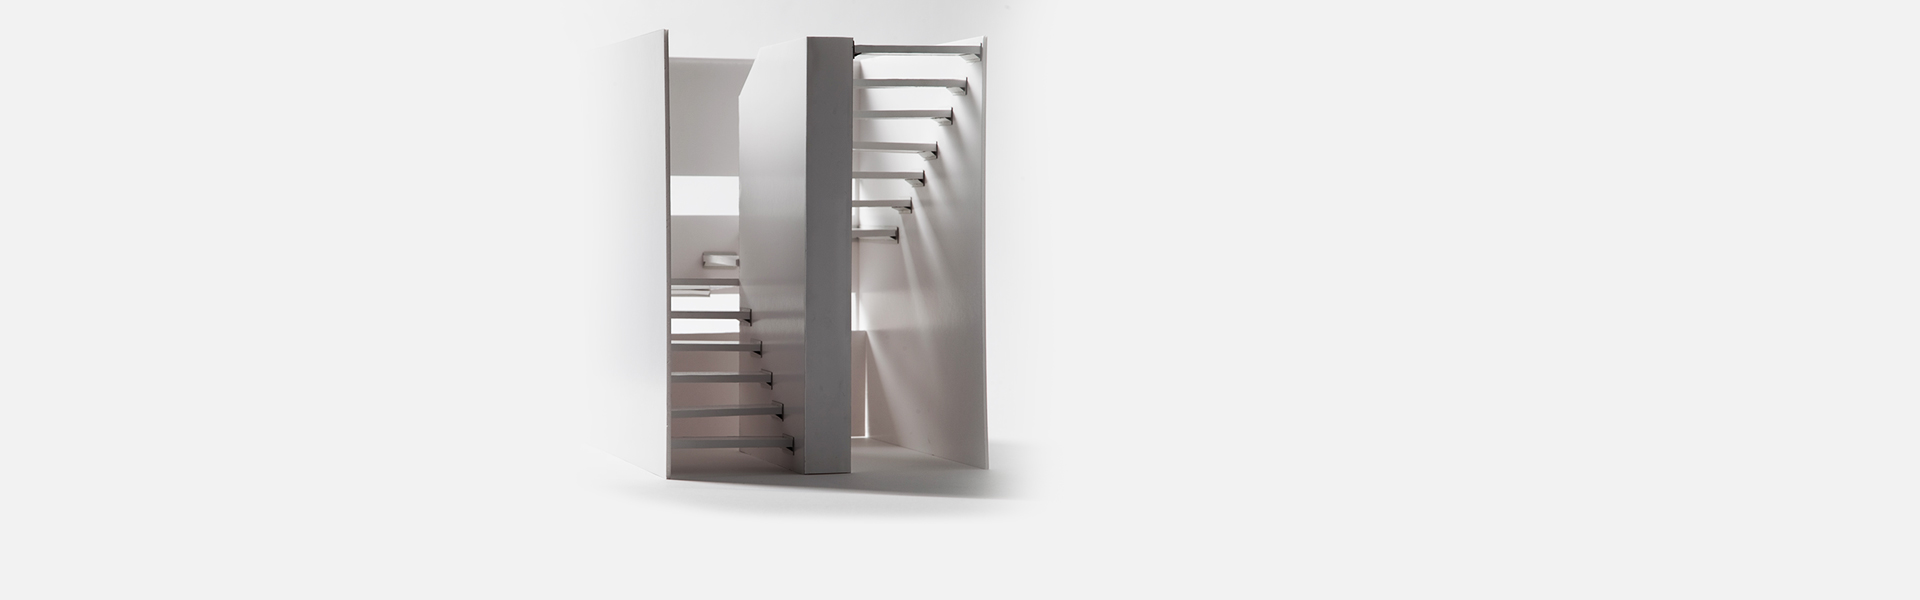 Ifat ecole architecture int rieure vannes morbihan bretagne for Ecole architecture interieur